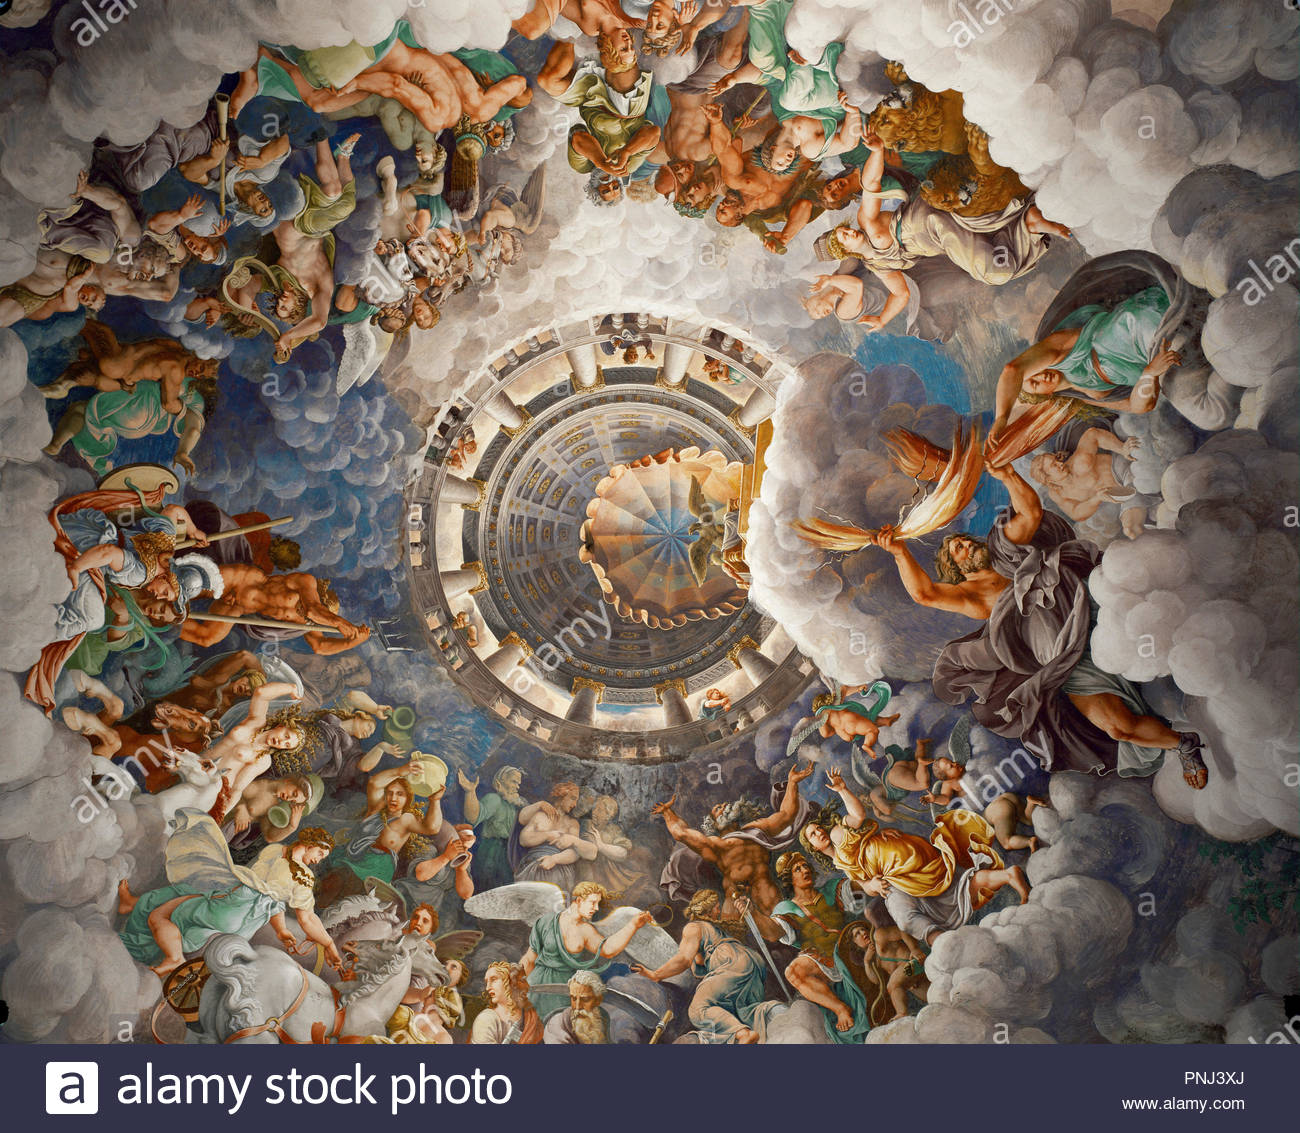 Olympus, seat of the Gods. Fresco (ca. 1532-1534). Author: ROMANO, GIULIO. Location: Palazzo del Te, Mantova, Italy. - Stock Image